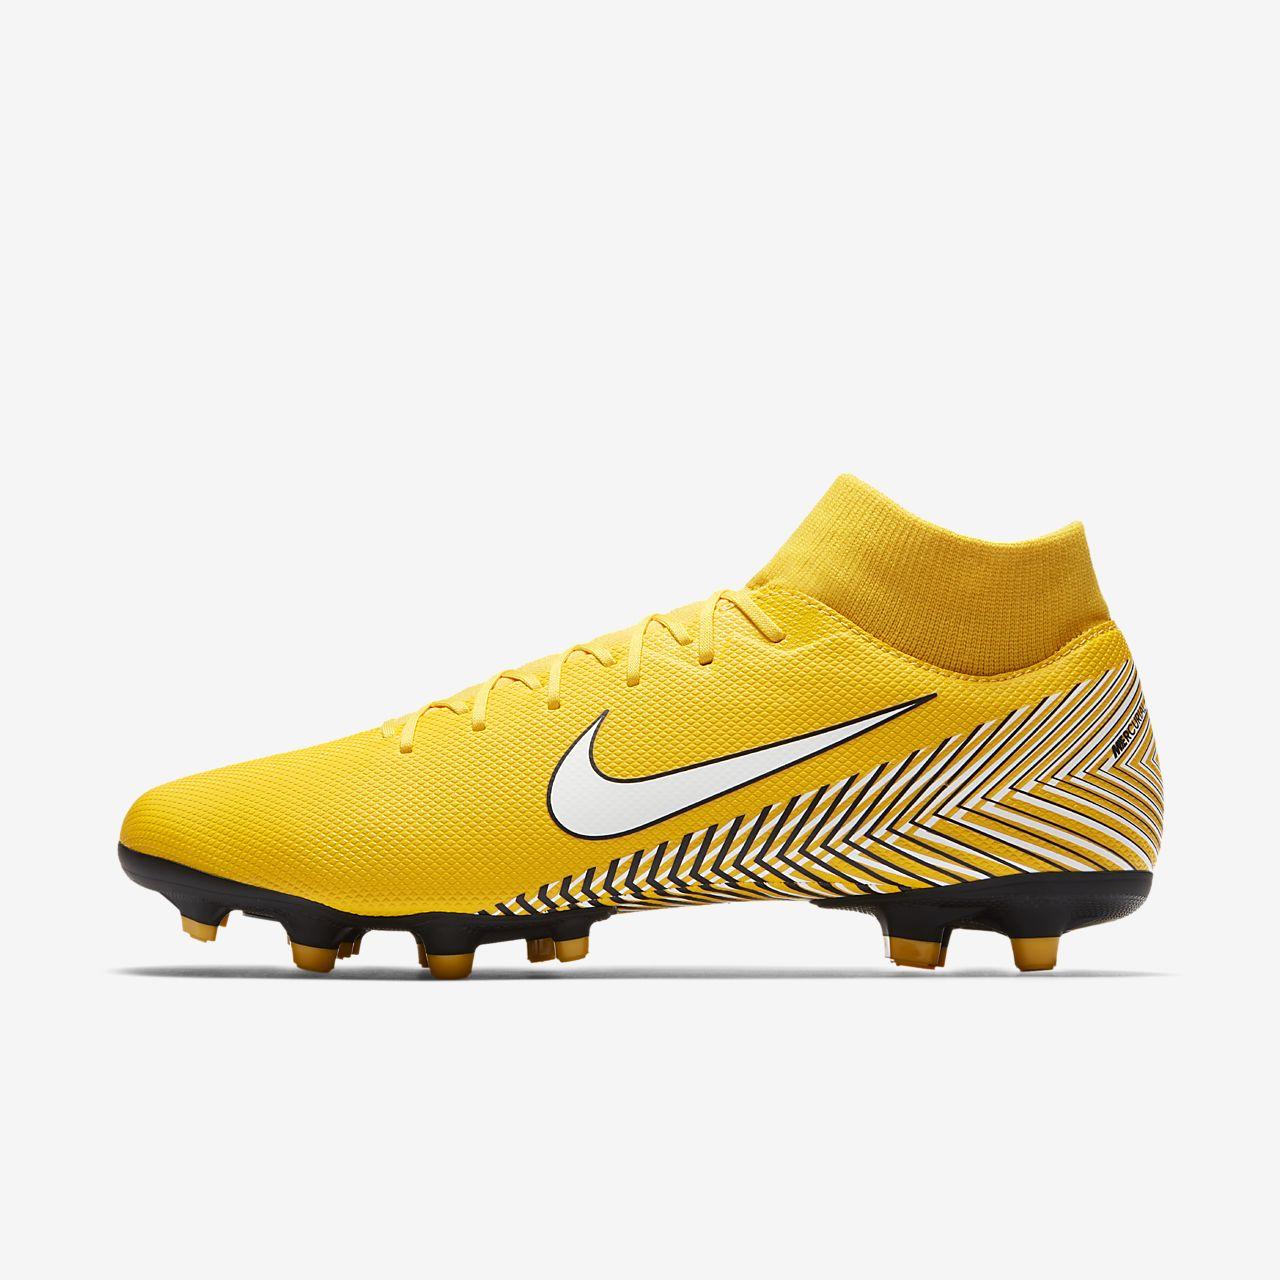 e33d3ca538b ... amazon nike mercurial superfly vi academy neymar multi ground soccer  cleat 347fc 8b8e9 coupon for new football boots nike hypervenom phinish fg  ...